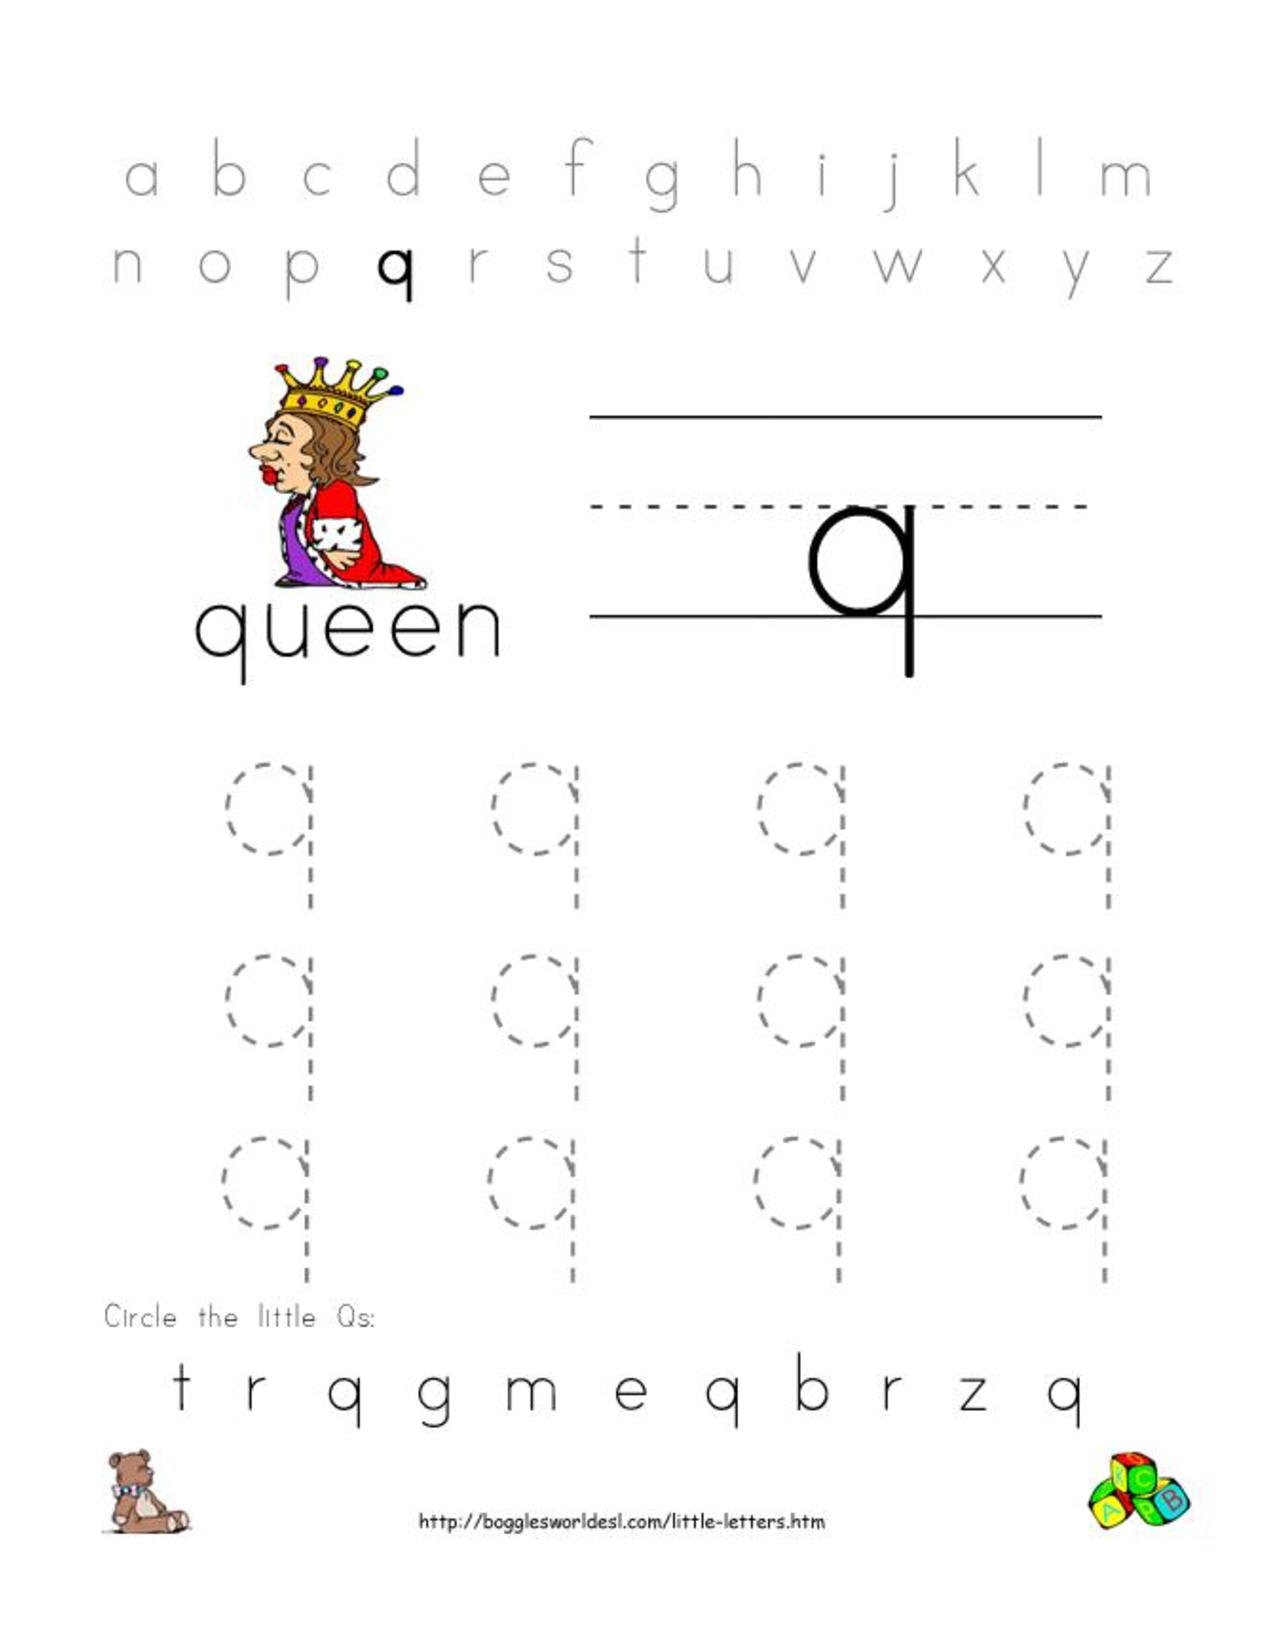 Alphabet Worksheets for Preschoolers | Alphabet Worksheet Little ...